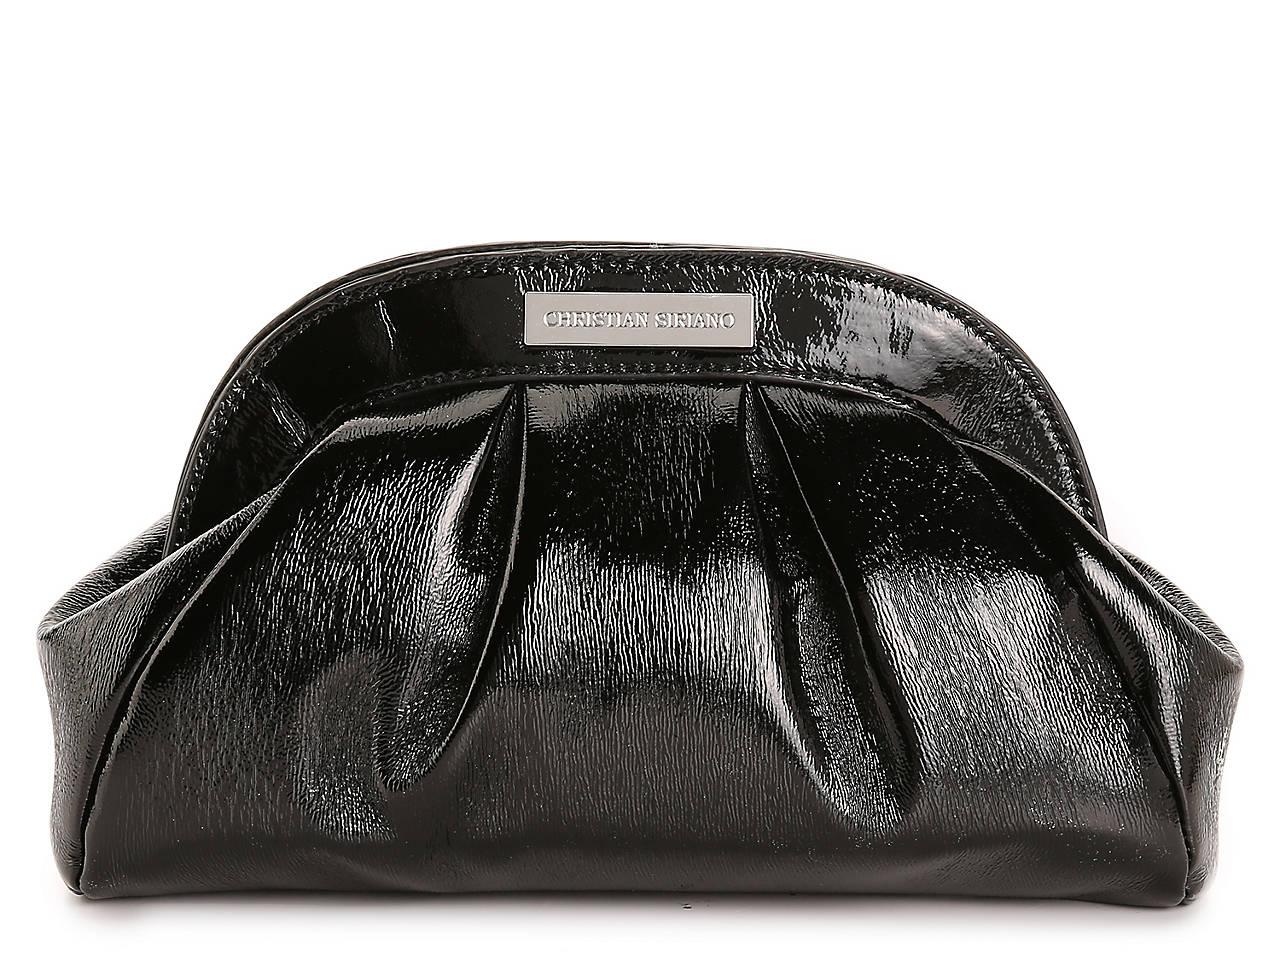 Christian Siriano New York Nicki Clutch Women s Handbags ... 35da7f4e305c